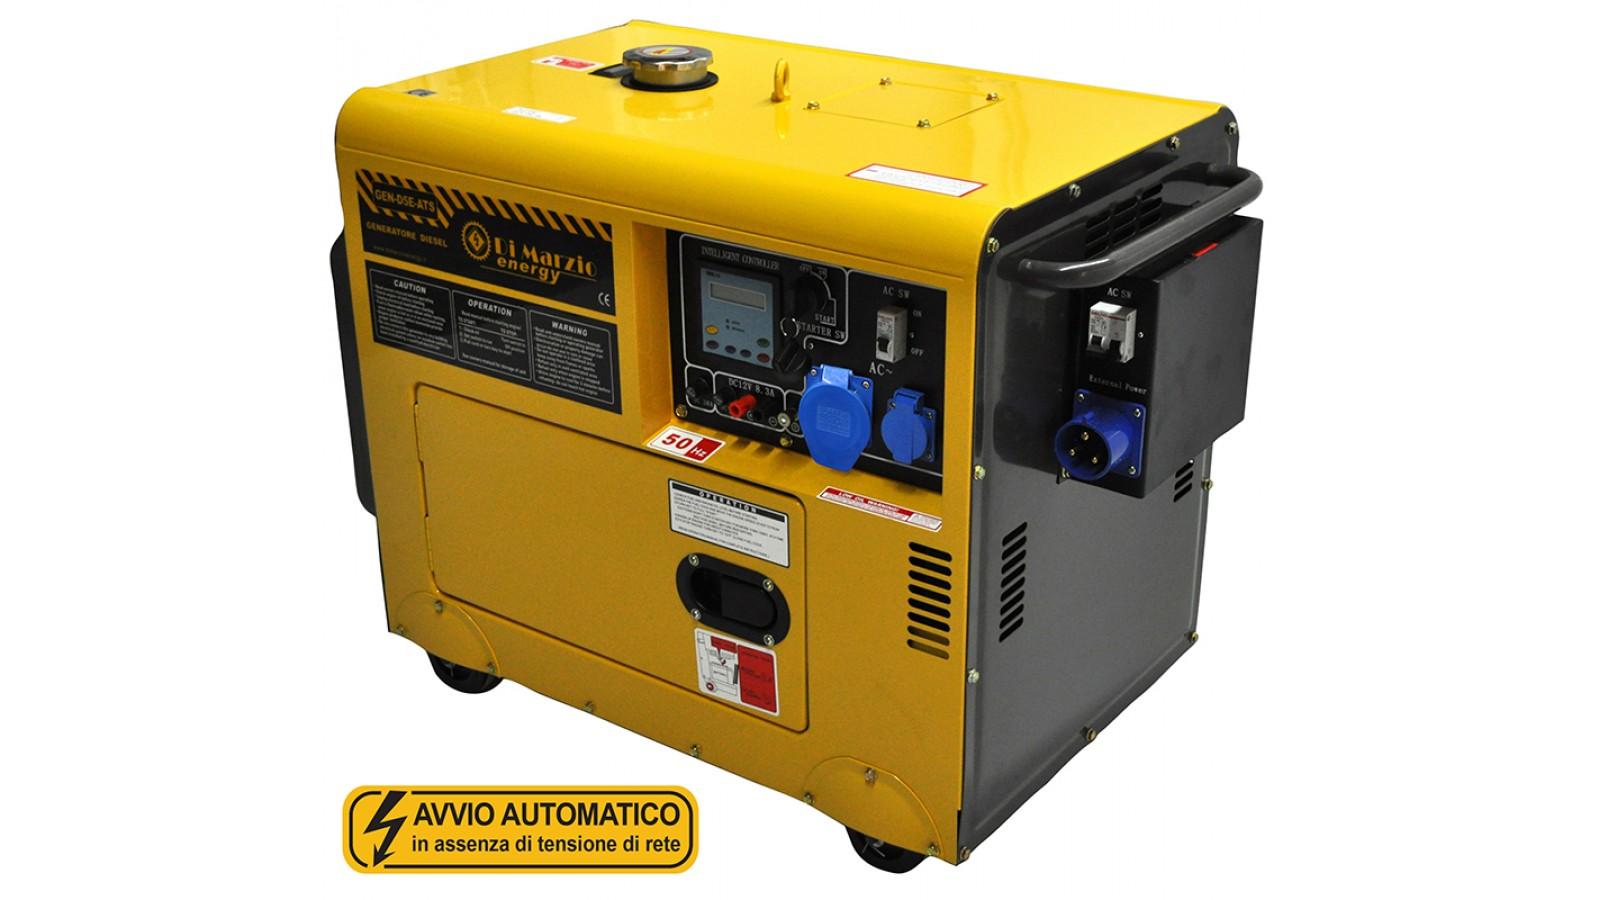 Generatore di corrente diesel 4 5 kw gruppo elettrogeno for Gruppo elettrogeno diesel 10 kw